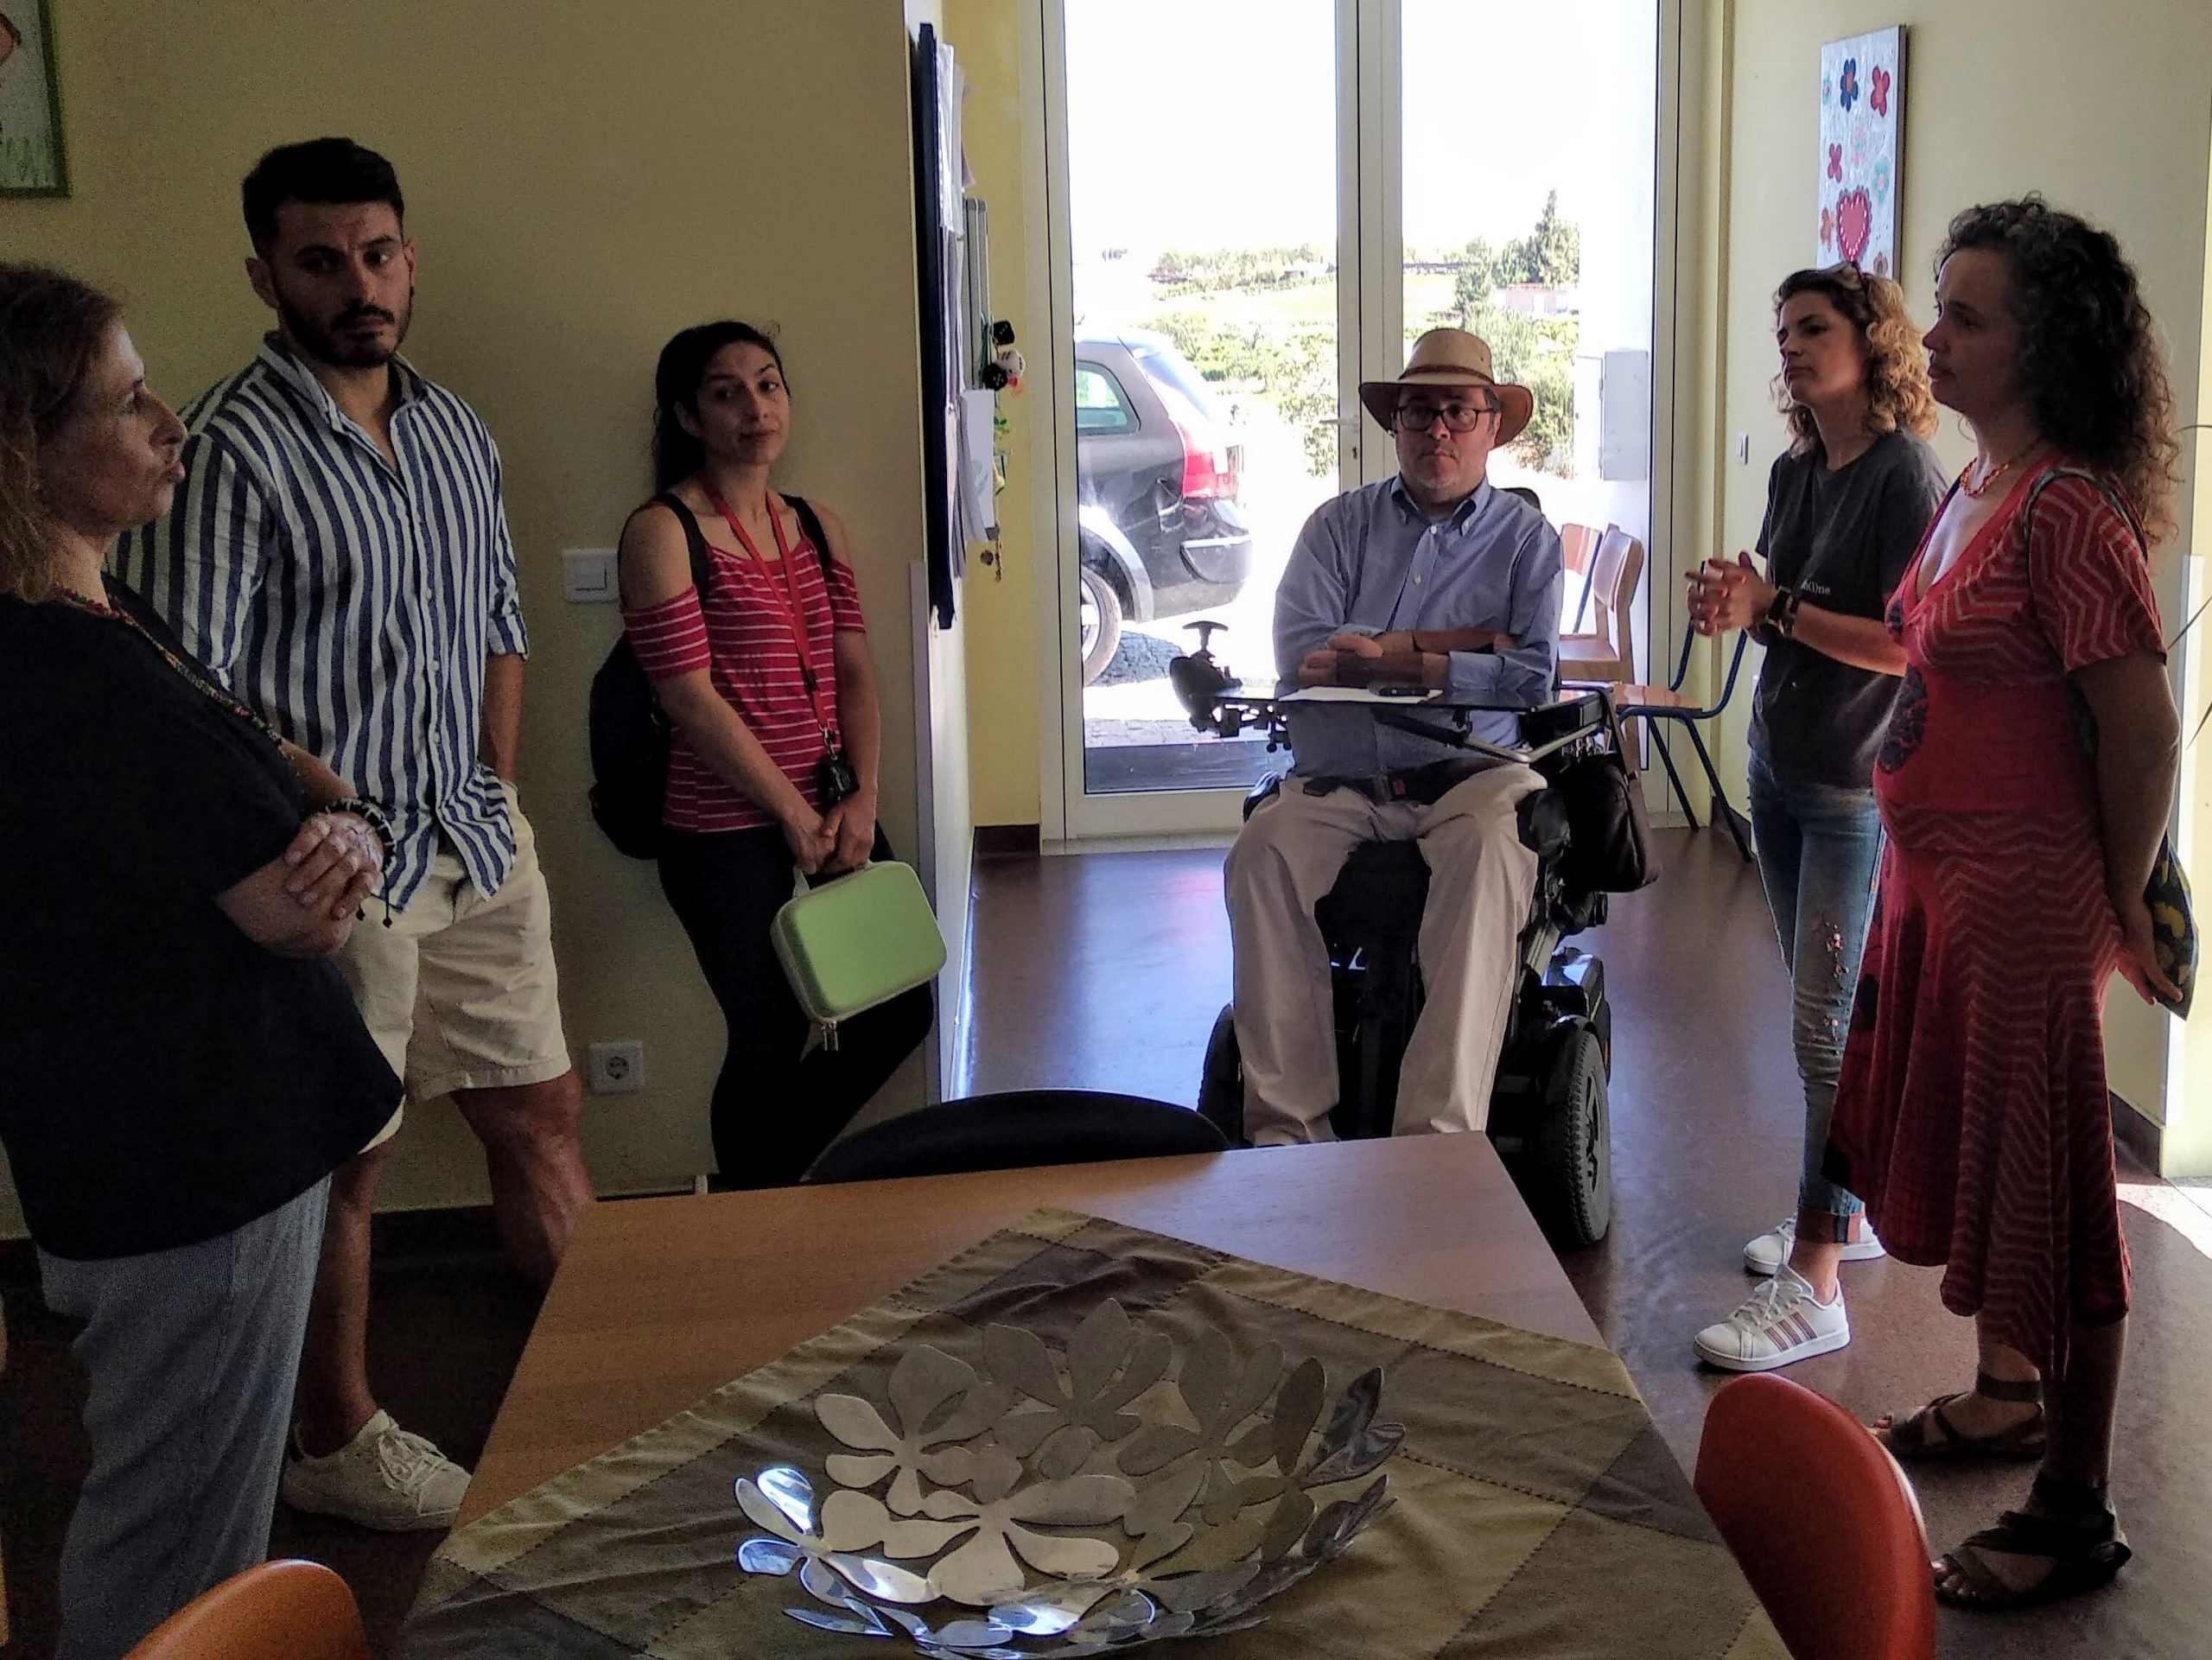 Bloco Vila Real visita Lar Residencial da APPACDM em Alijó